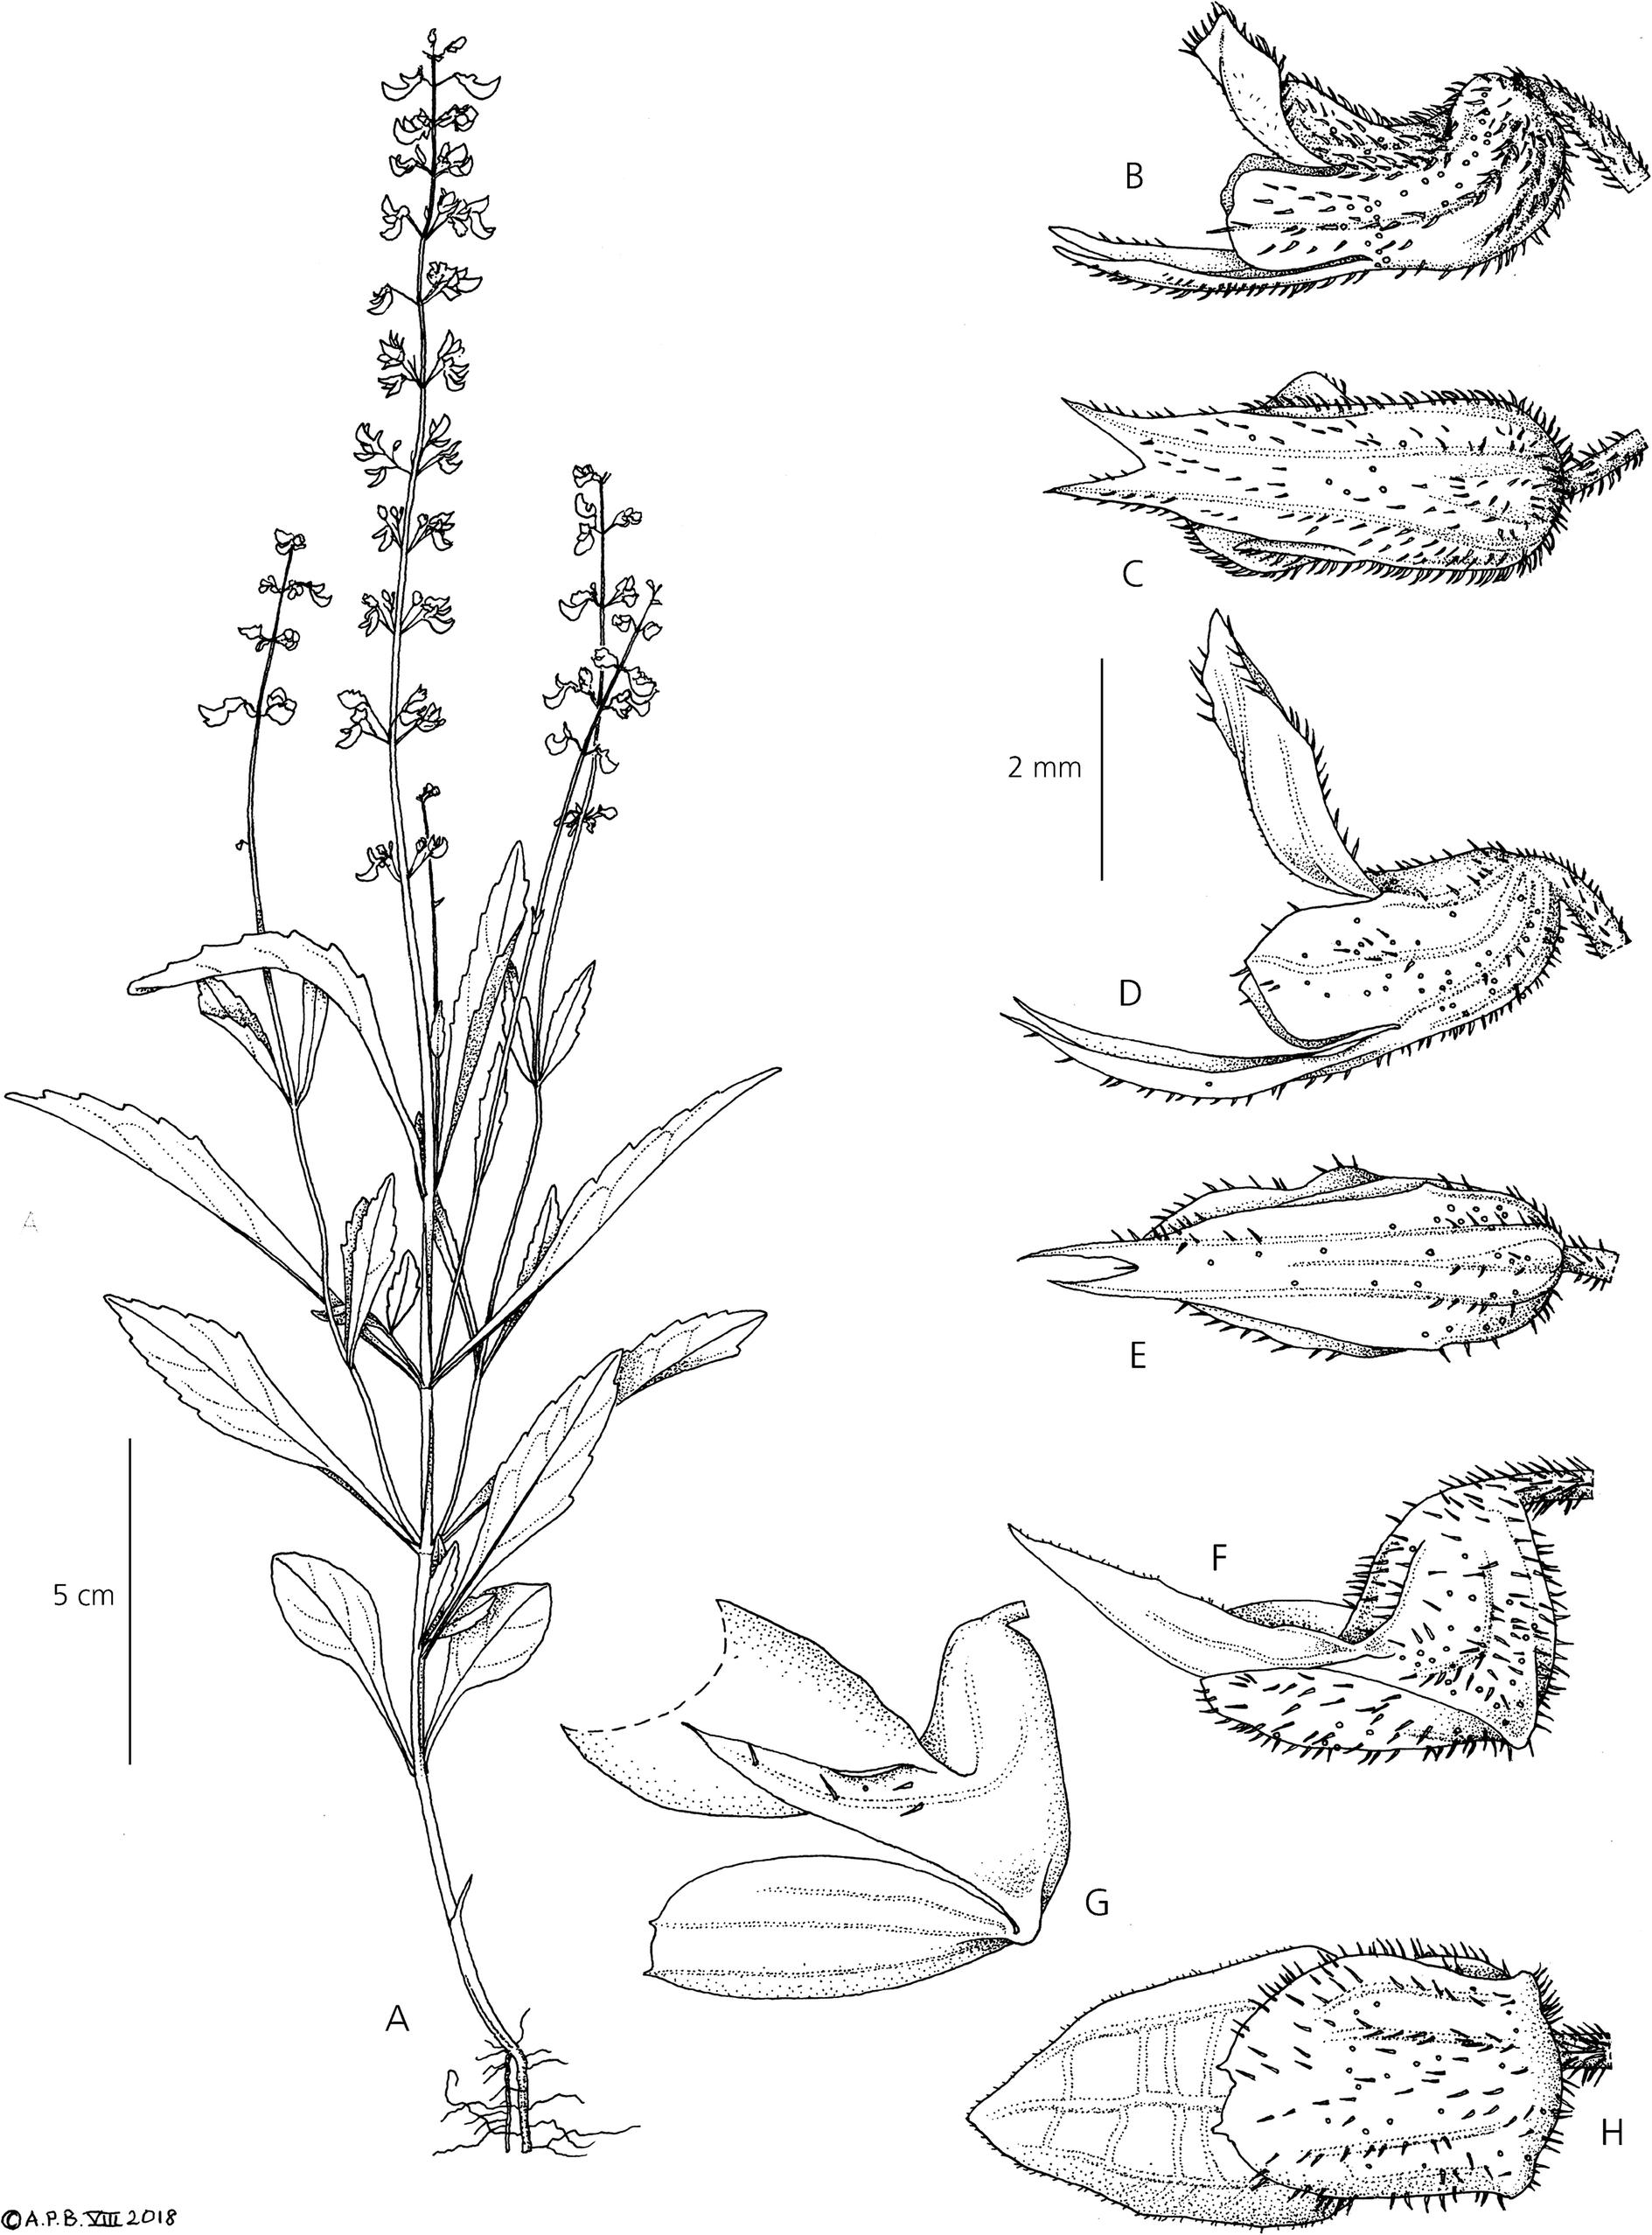 Three species of Coleus (Lamiaceae) from the Guinean